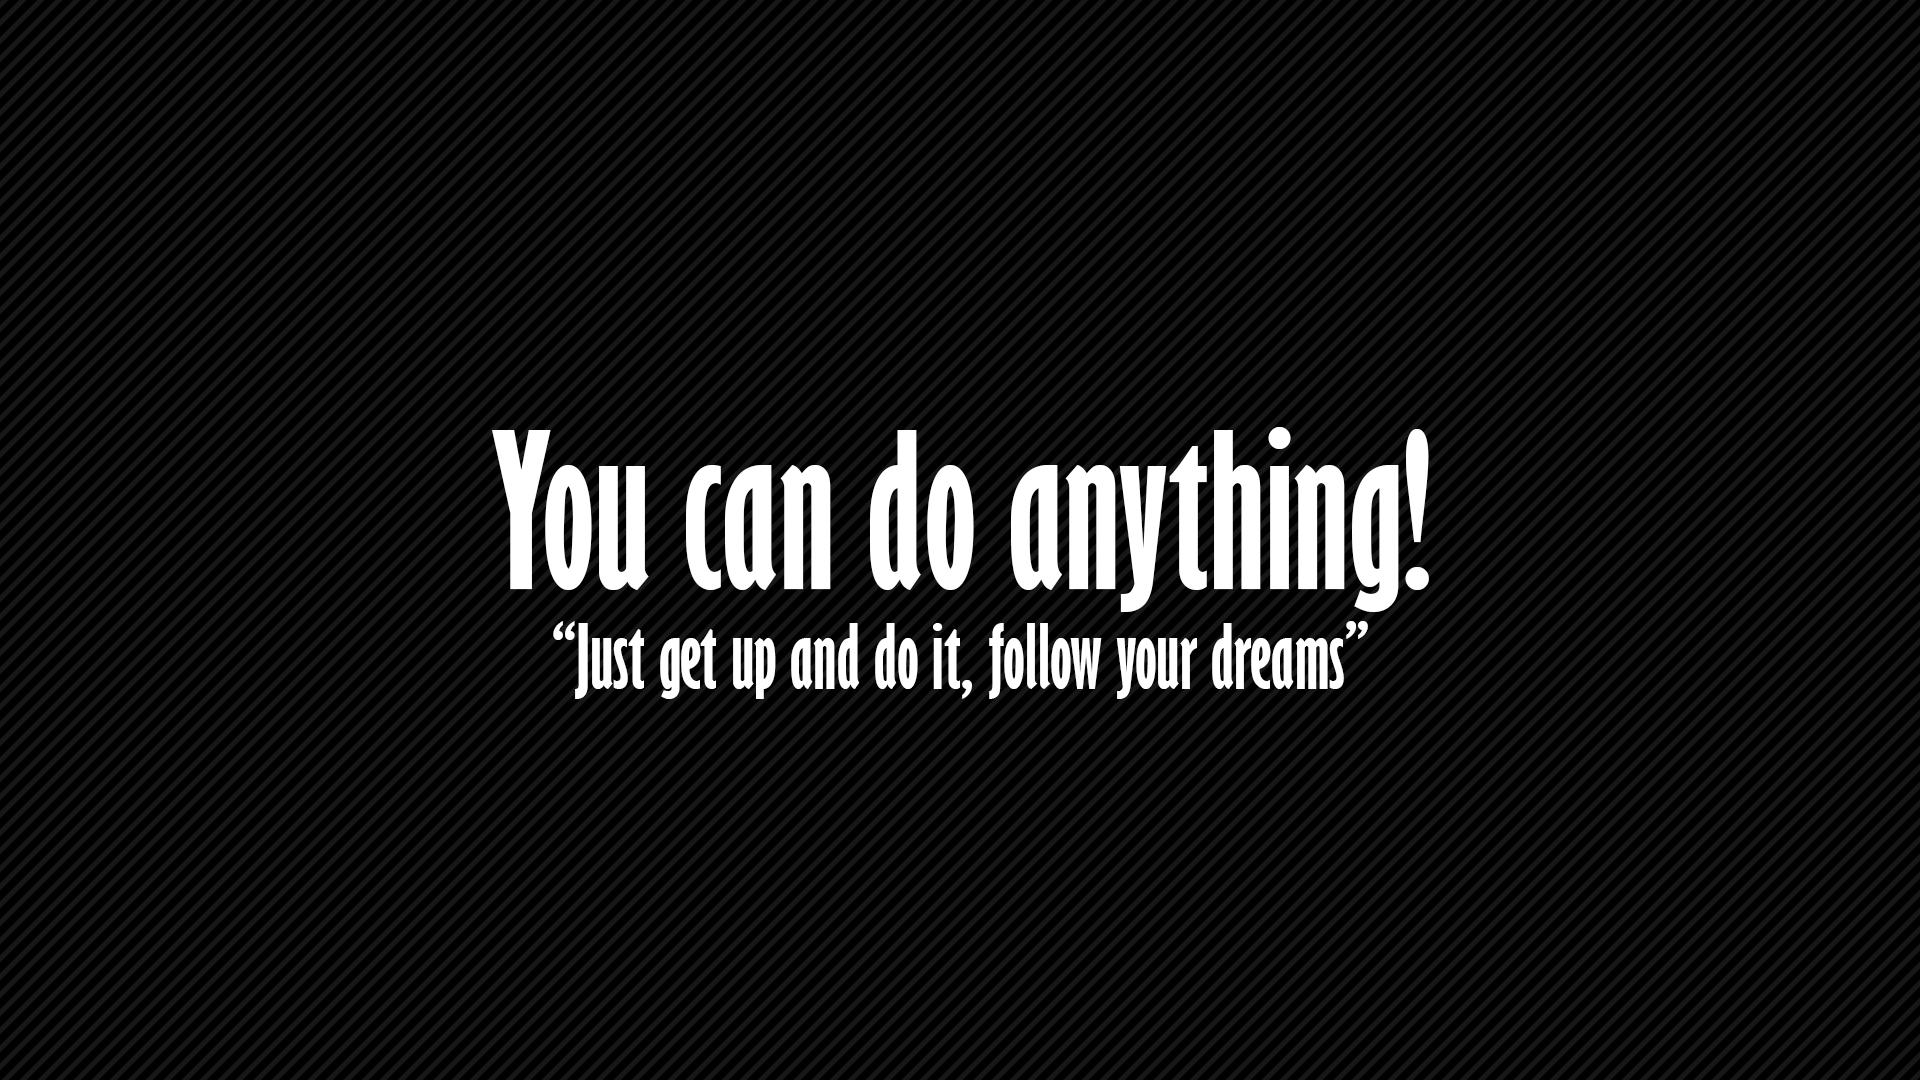 Inspirational Quotes Hd Wallpapers Pixelstalk Inspirational Quotes